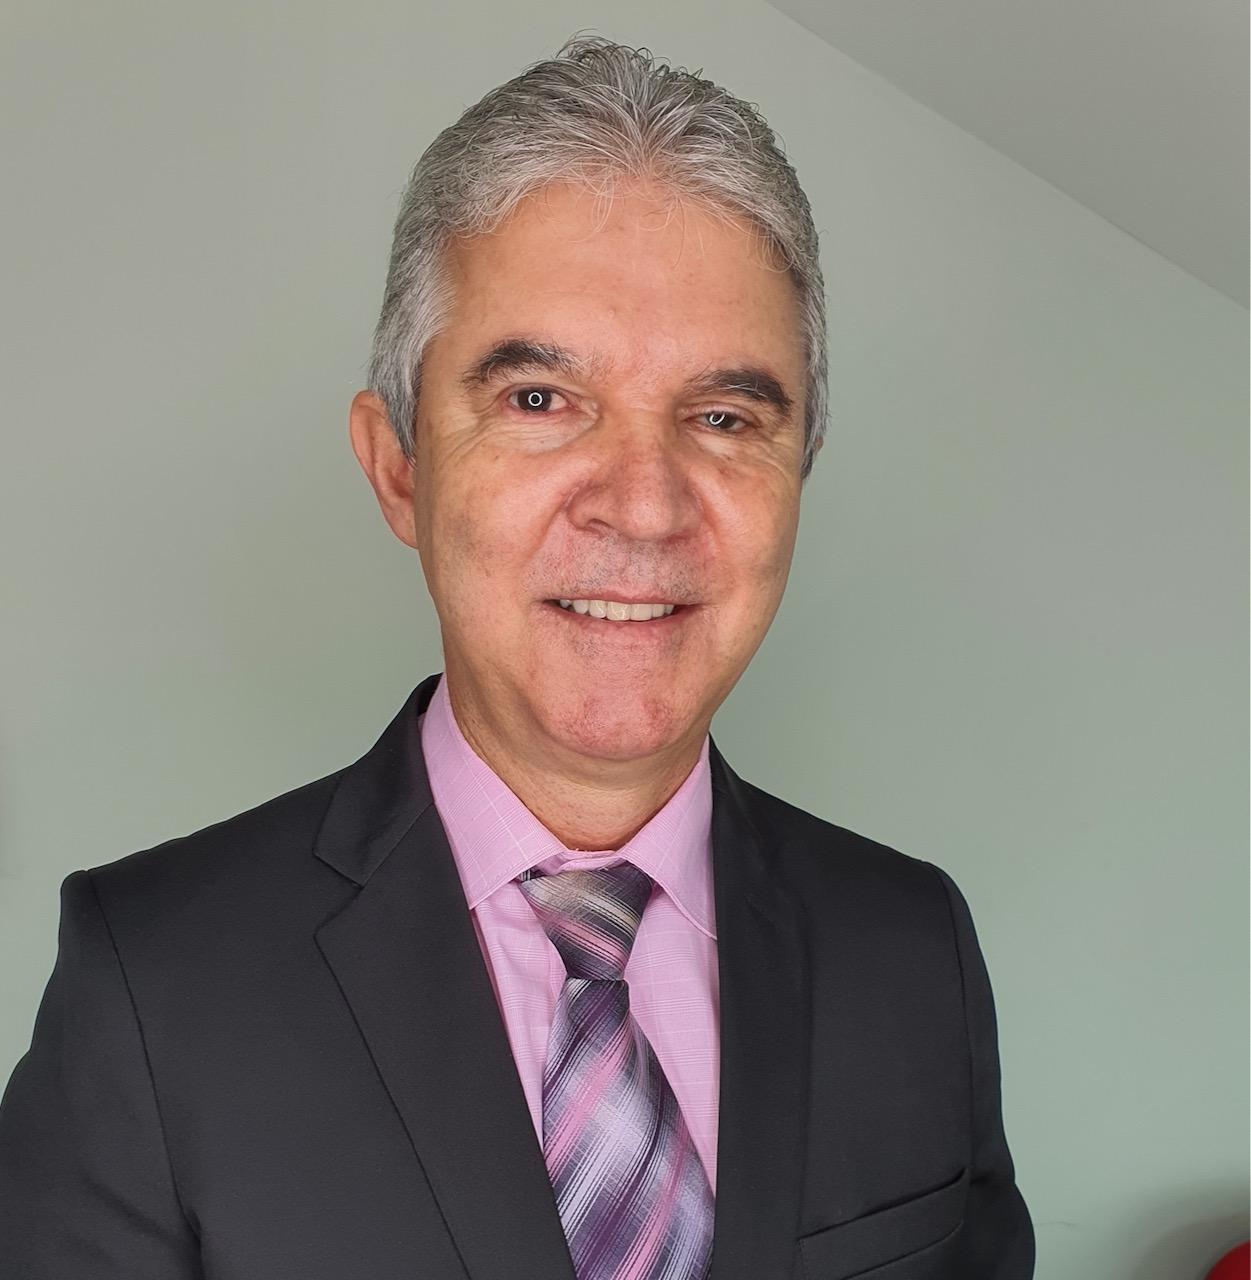 Pastor Orestes Dos Santos Nunes